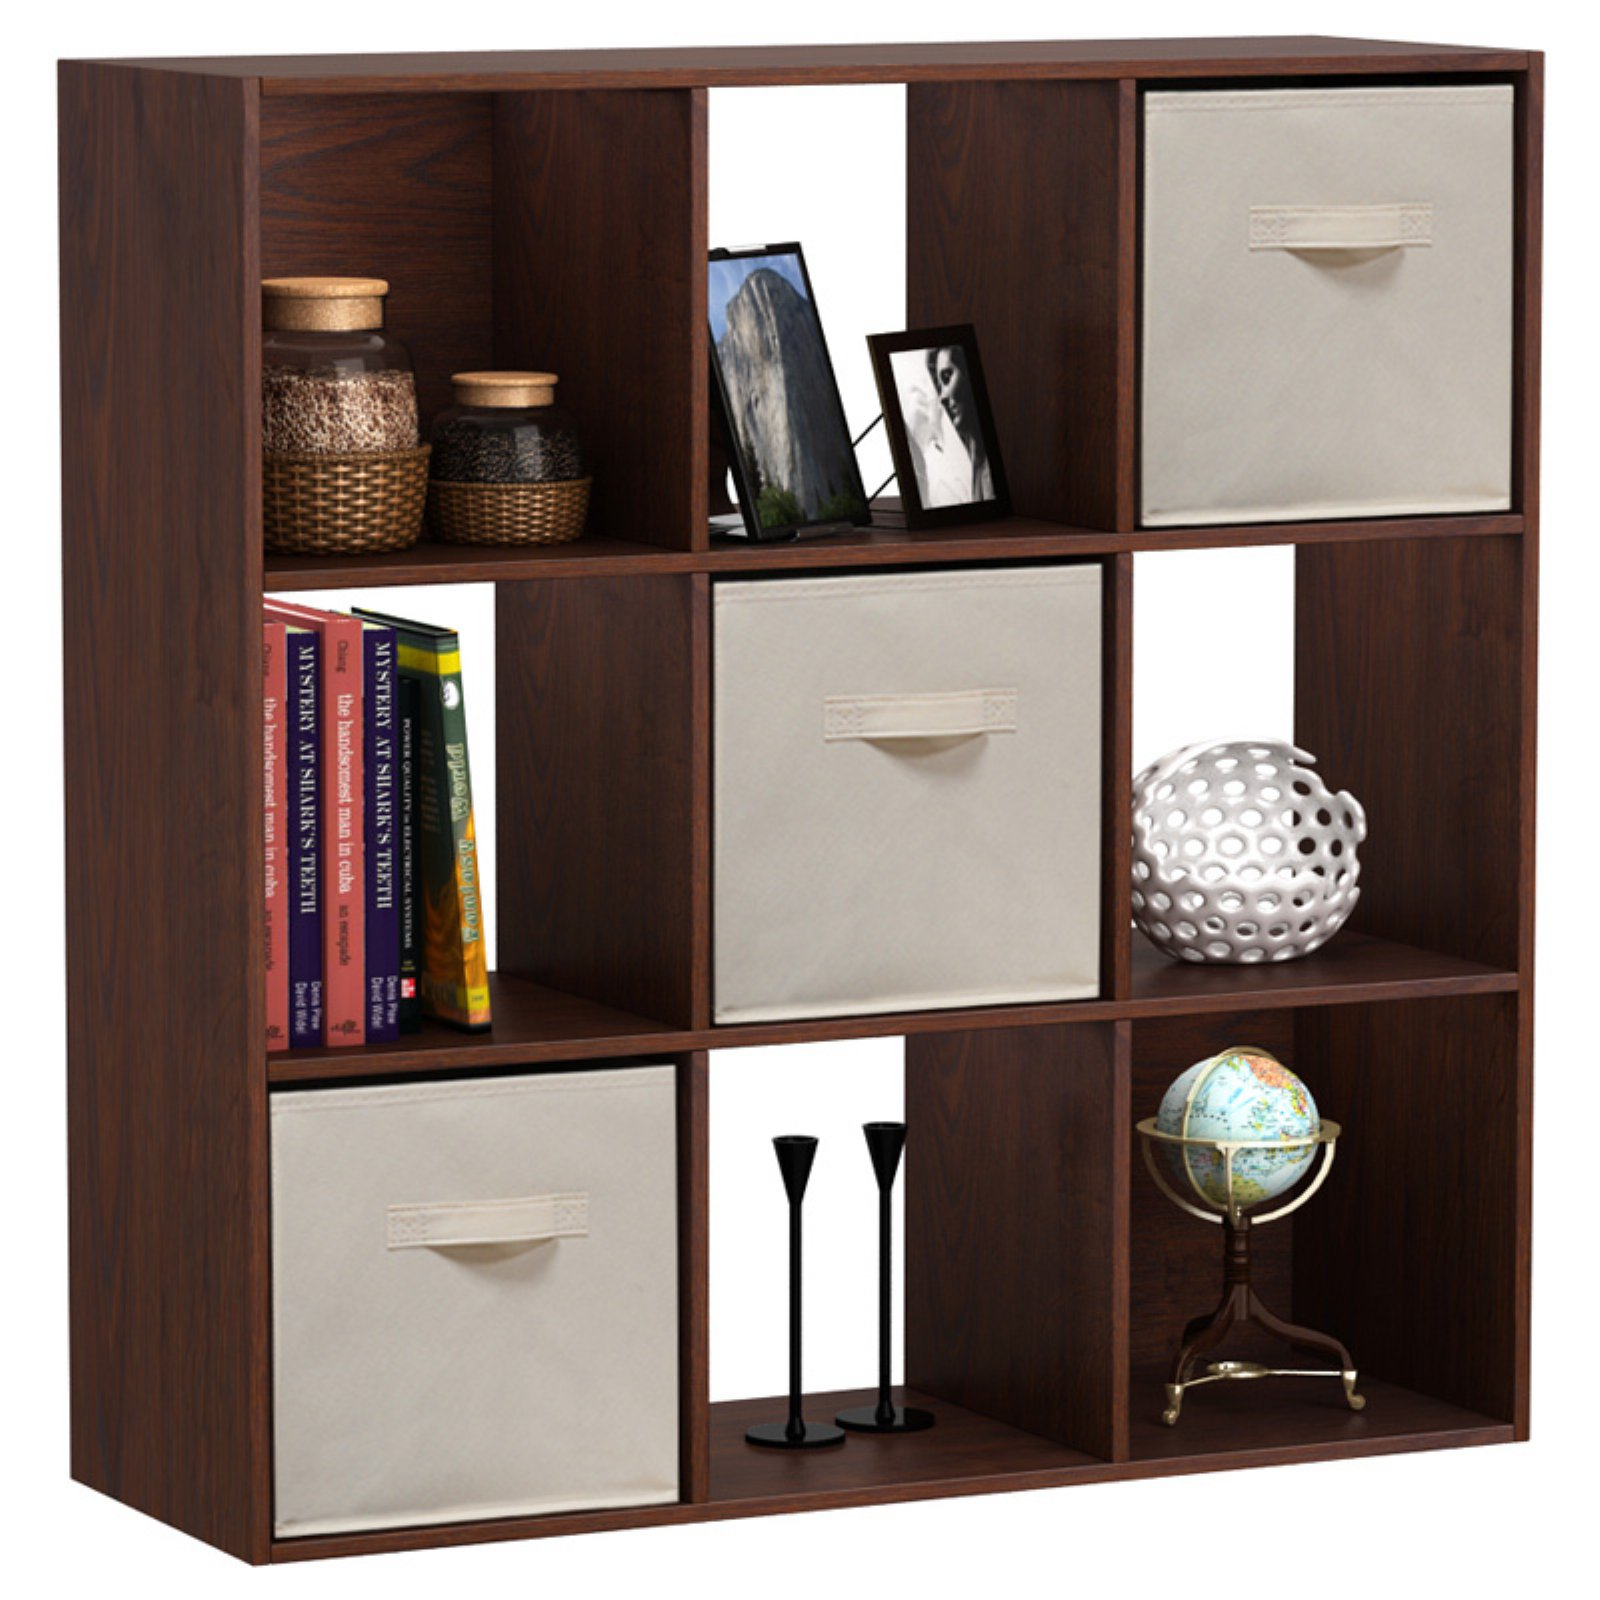 tier bookcase espresso ladder shelf itm bookshelf av bookcases rack storage wood leaning